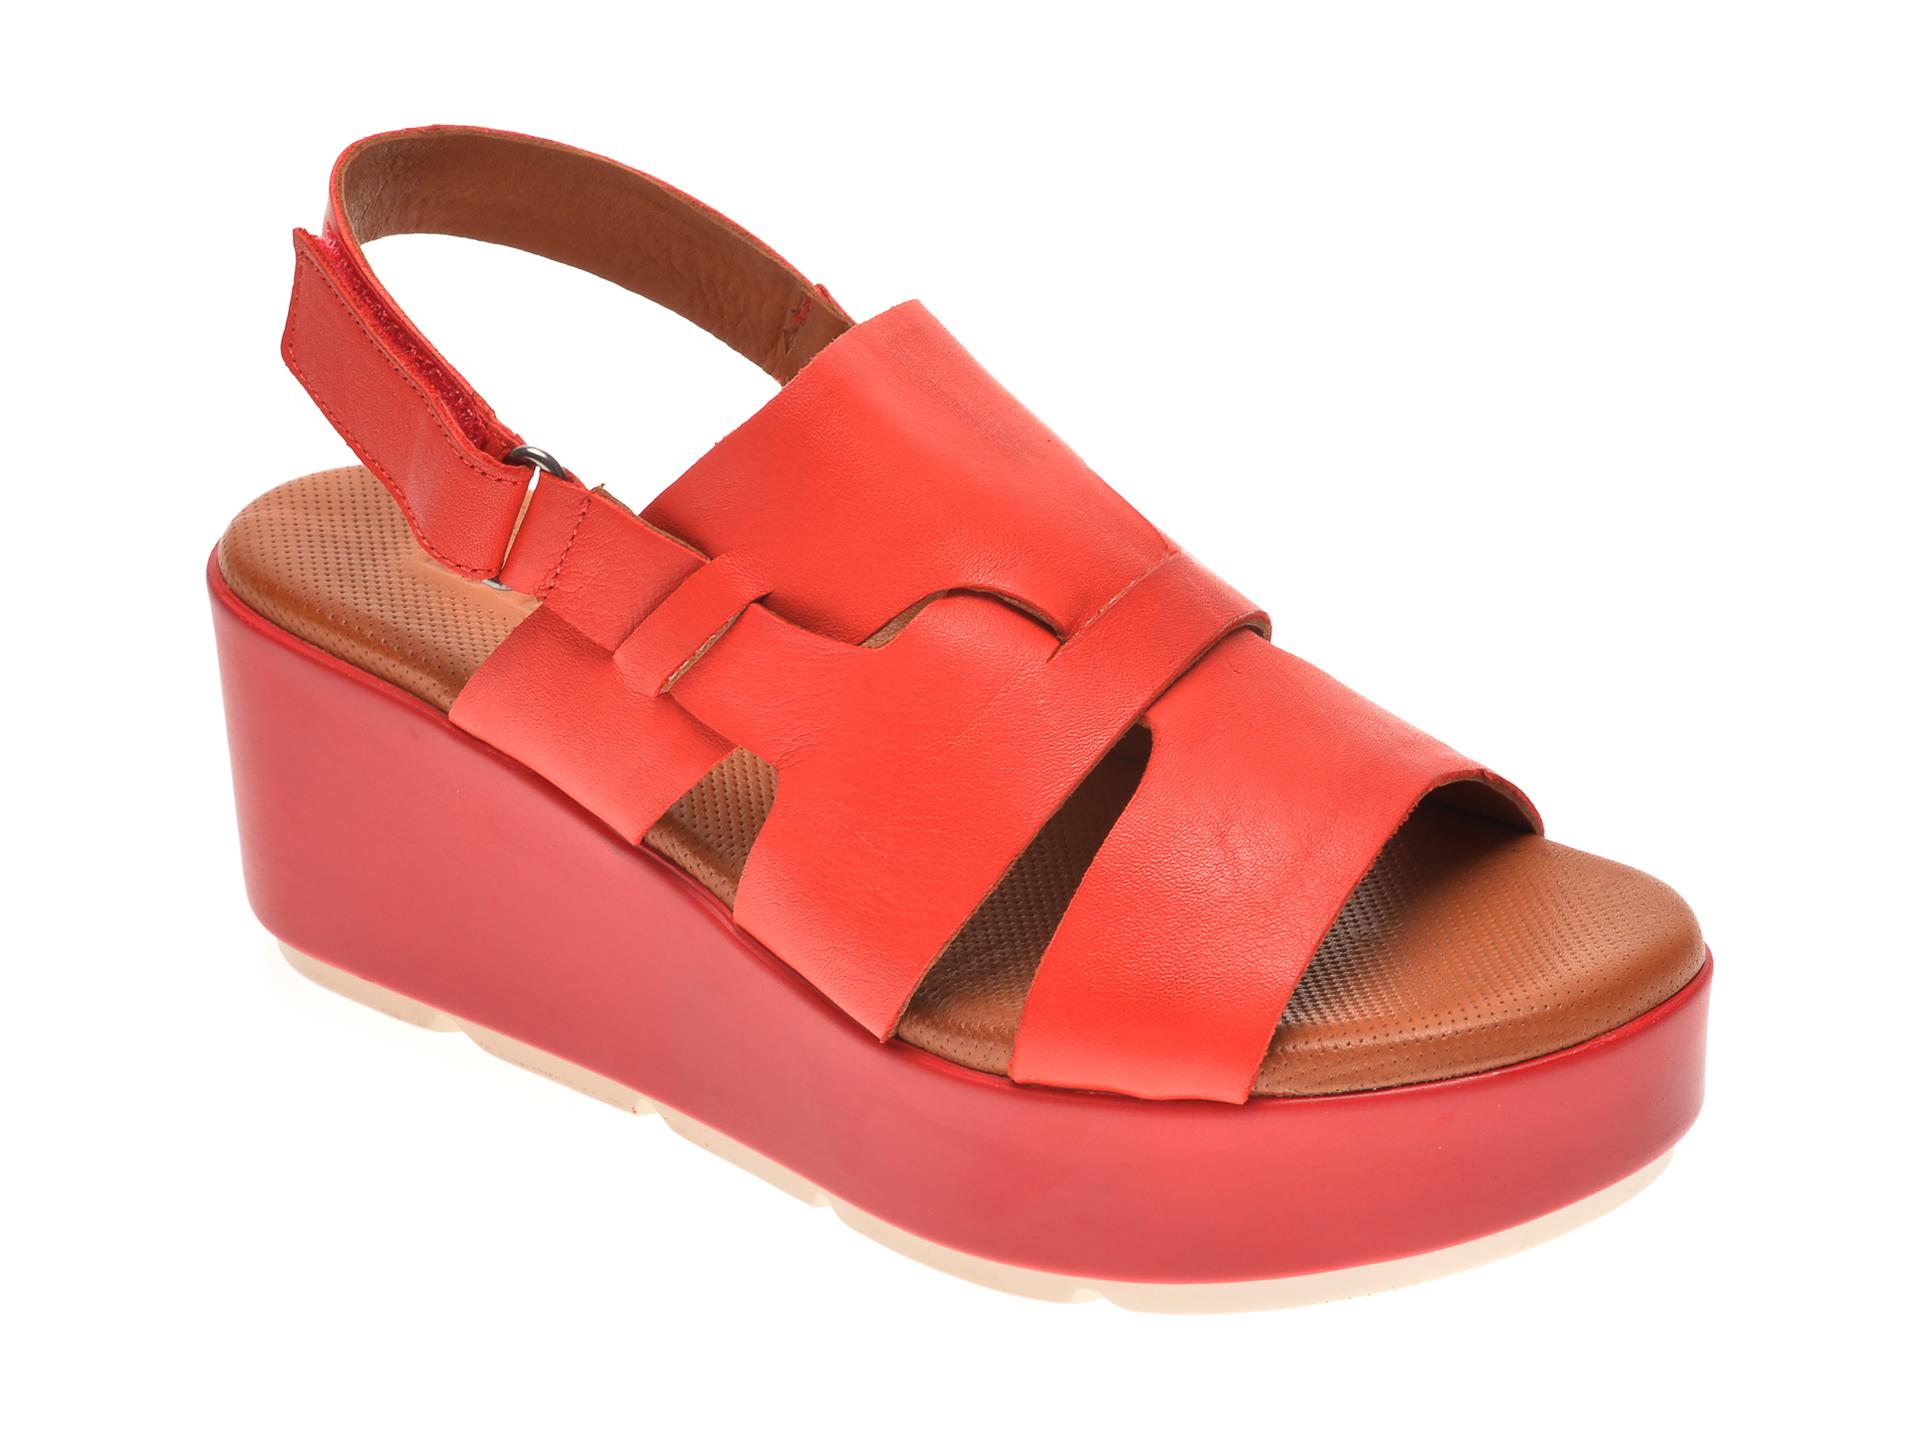 Sandale BABOOS rosii, 2519, din piele naturala